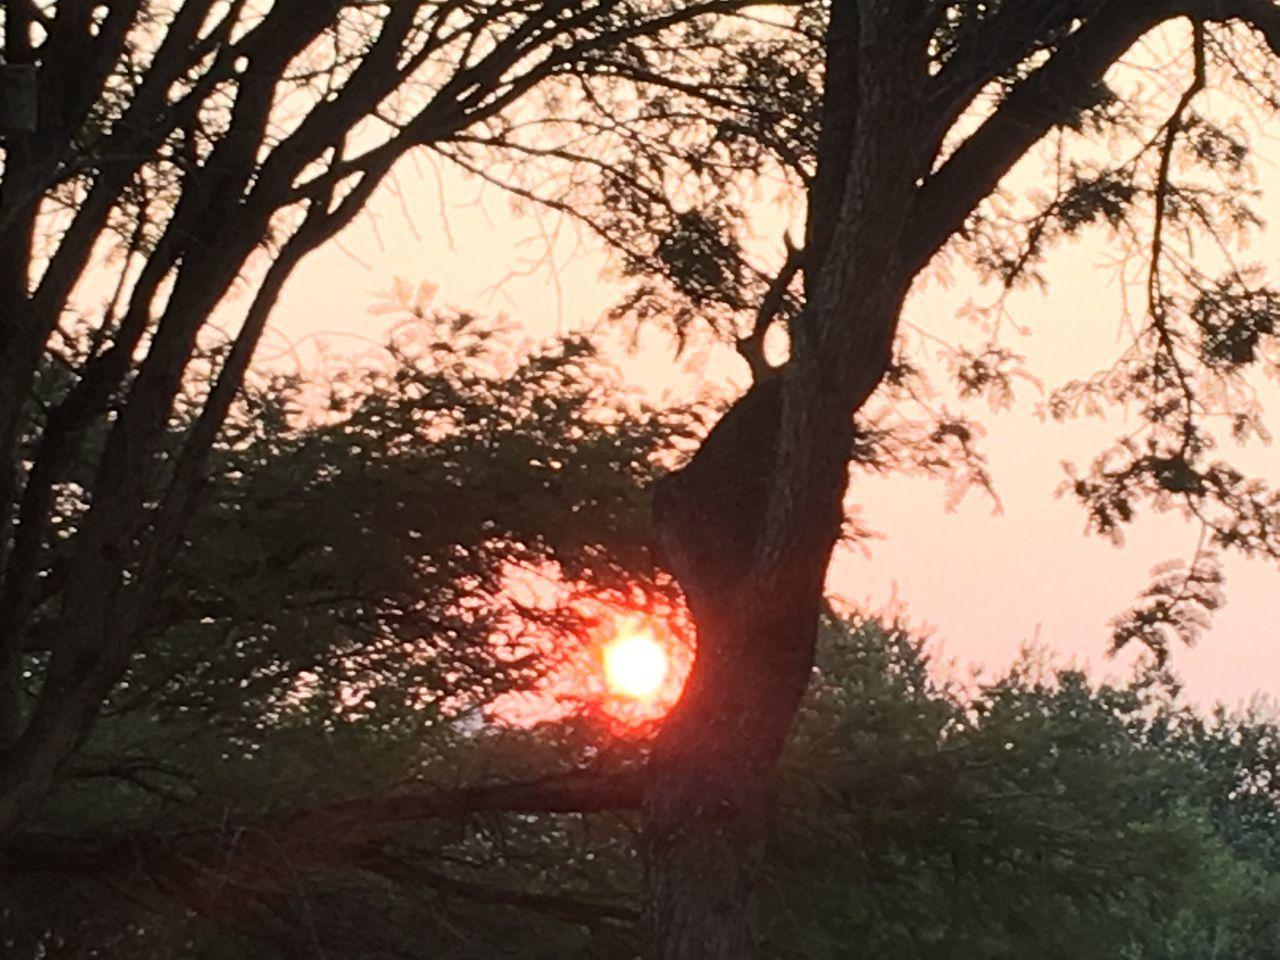 Nature Is Beauty Of Soul. Nature Photography Tree Beauty In Nature Branch Sun Sunset Johannesburg Eye4photography  EyeEmBestPics EyeEm Best Shots EyeEm Gallery Best Capture EyeEmNewHere Nature Is The Best Medicine EyeEm Nature Lover Orange Color Orange Sun Between Tree Branch Ntsudzu